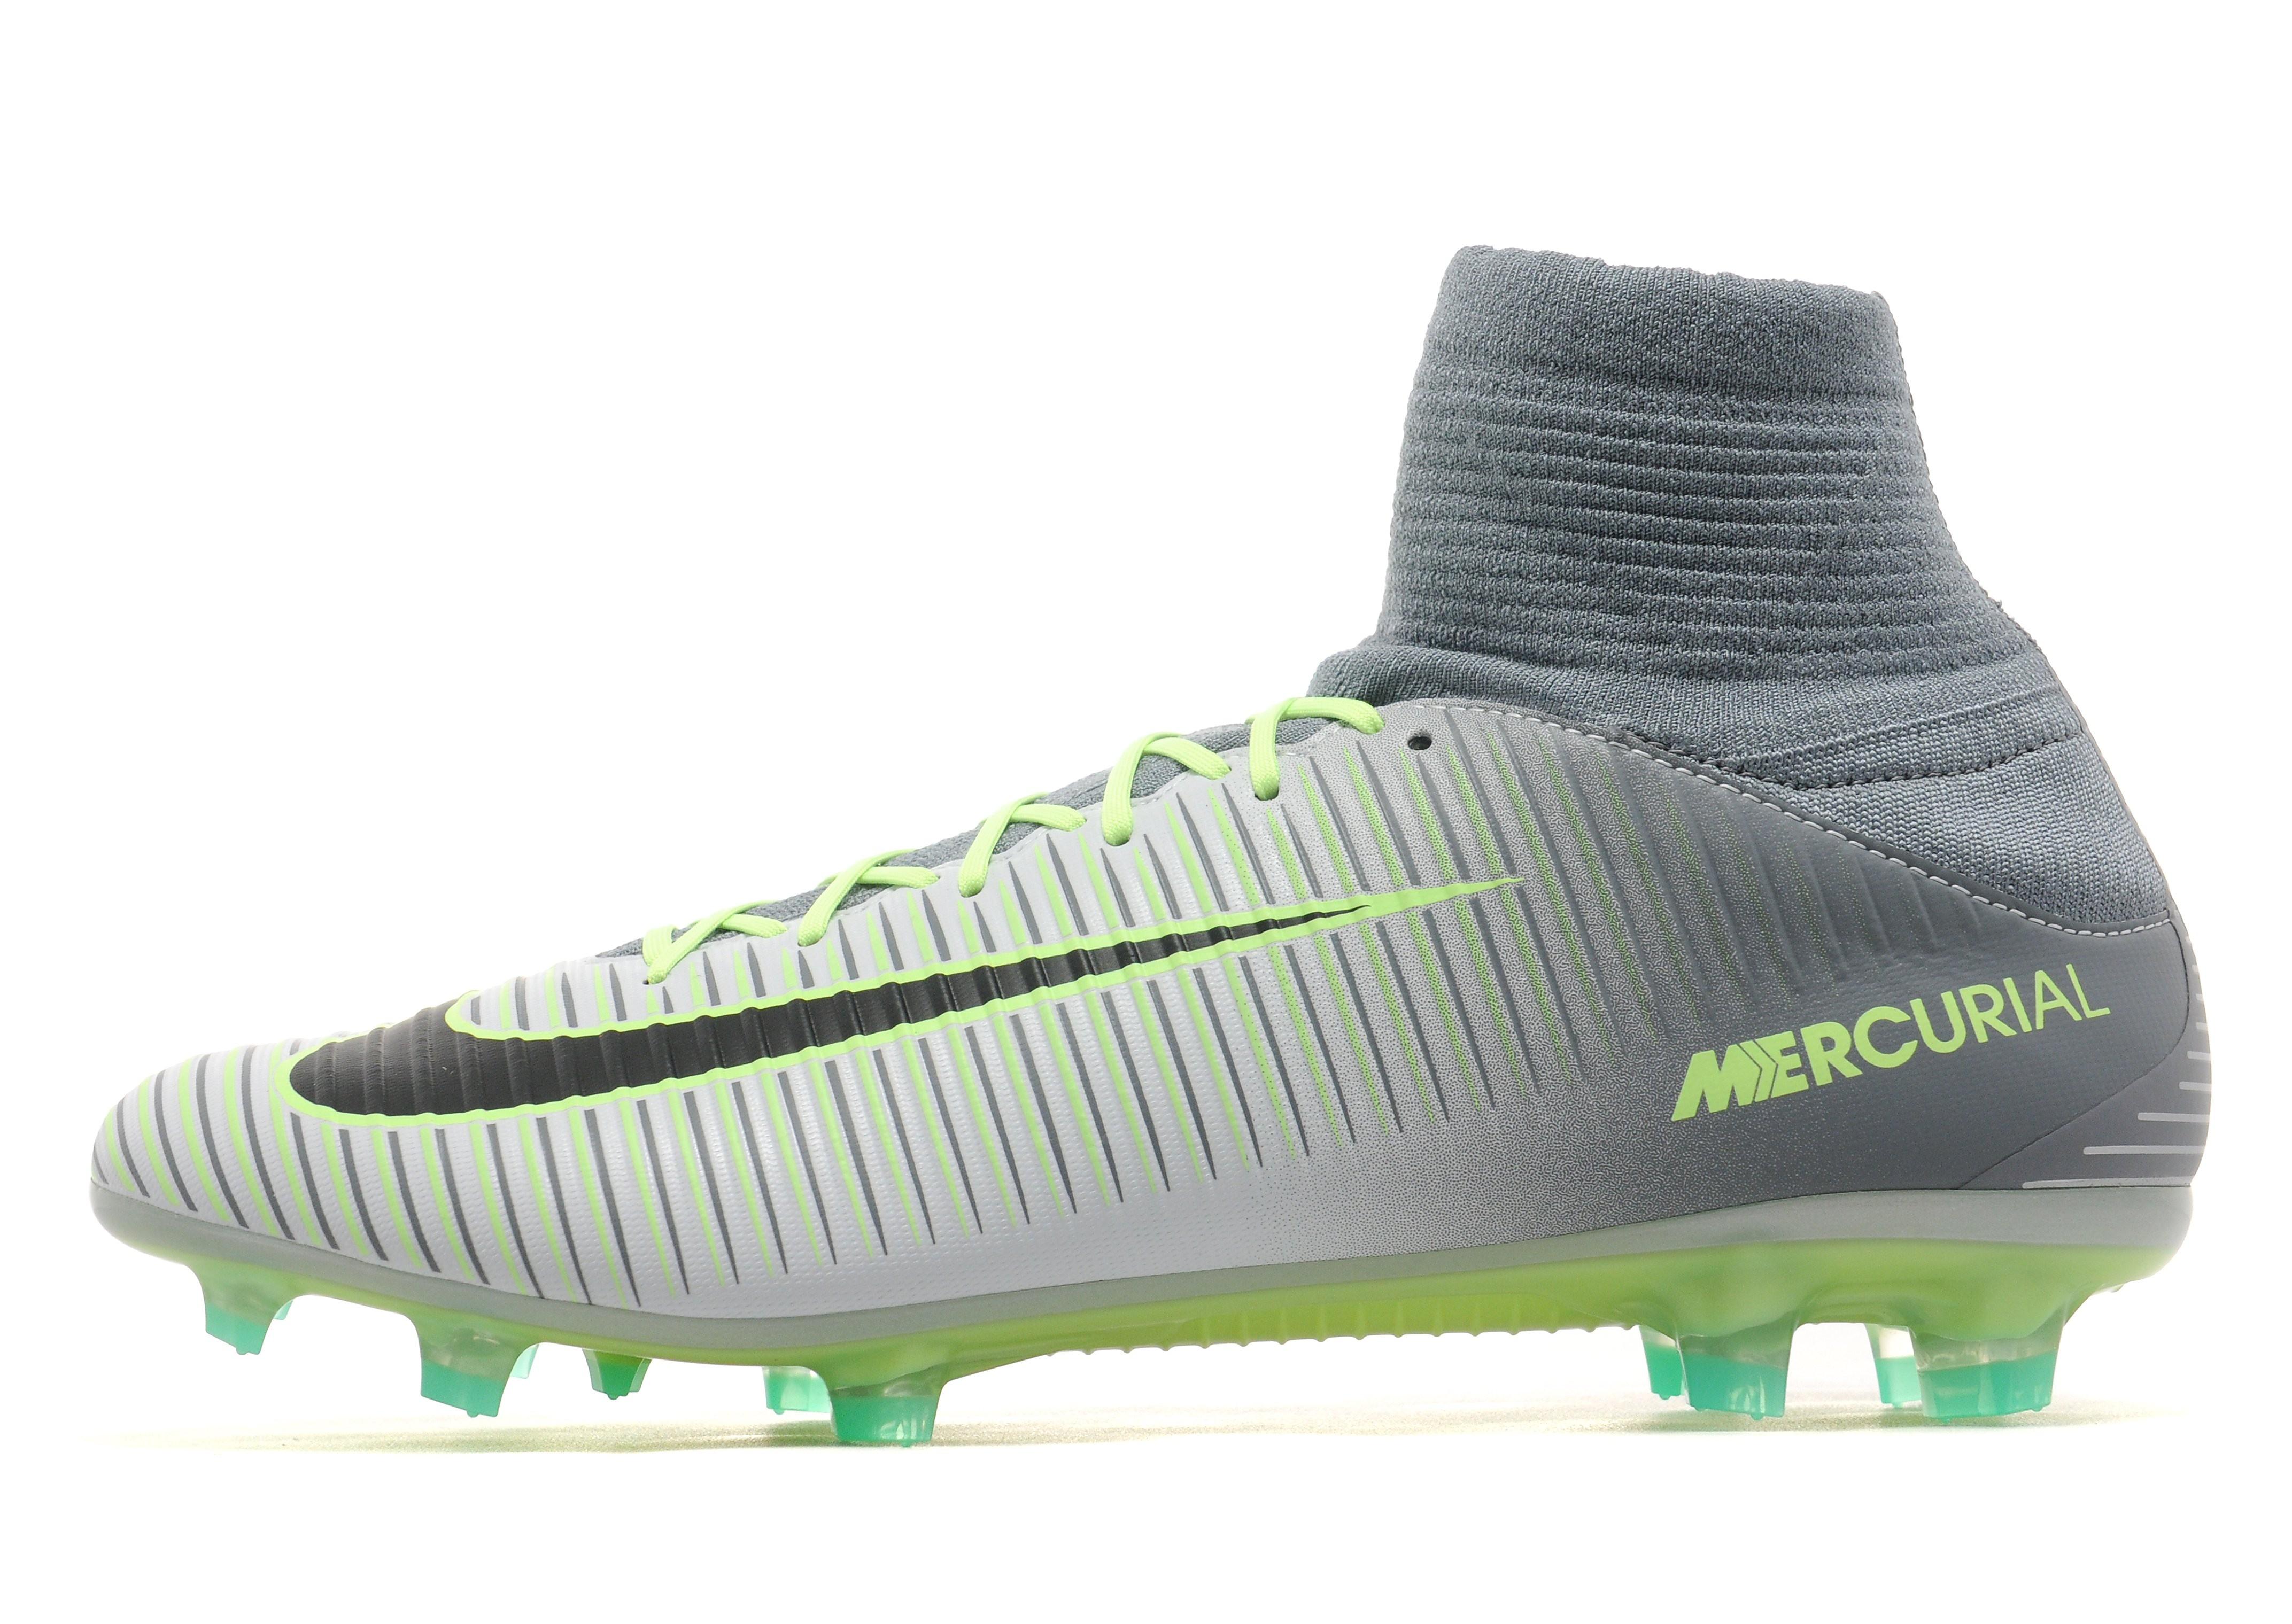 Nike Mercurial Veloce DF III FG Men's Football Boots